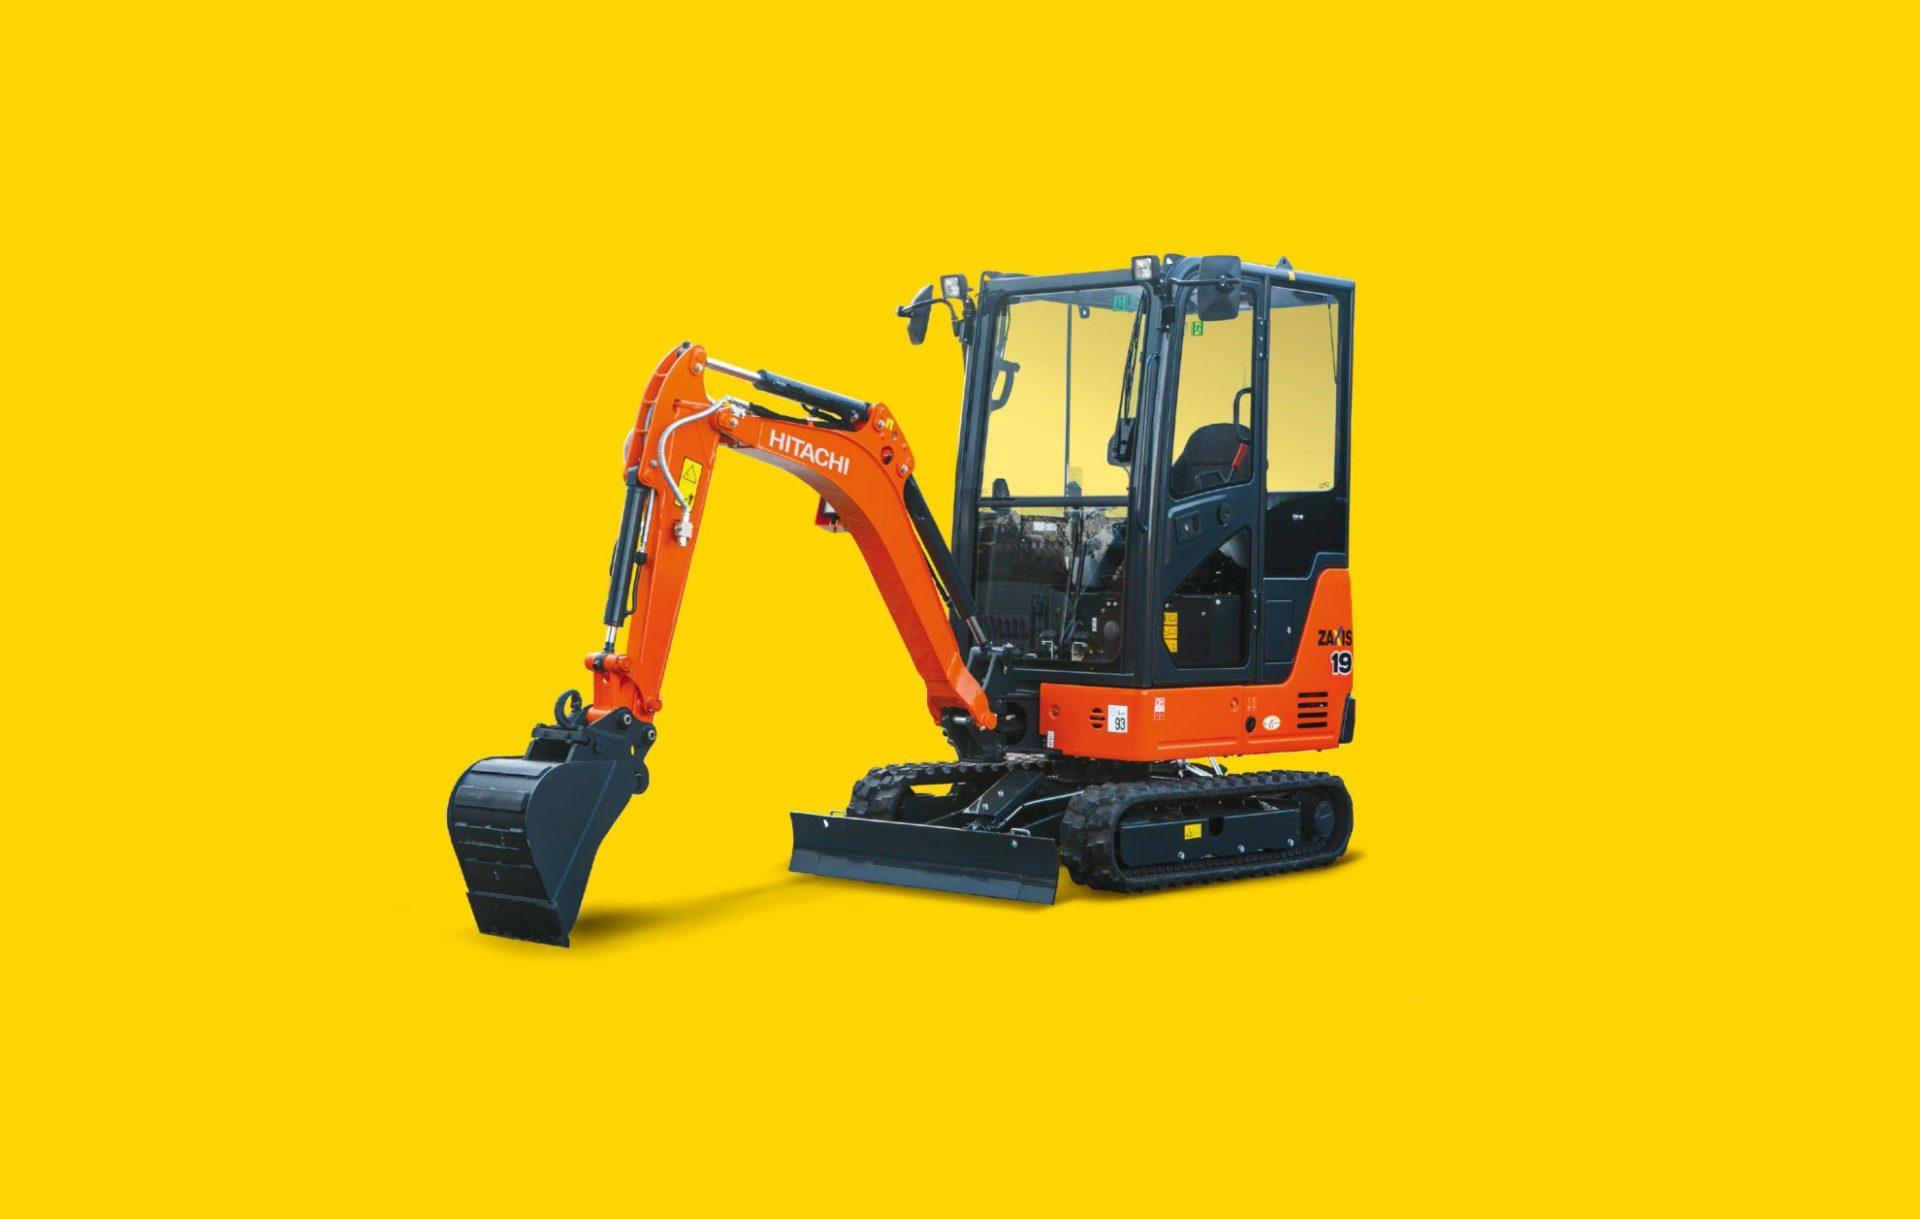 Hitachi compact excavators